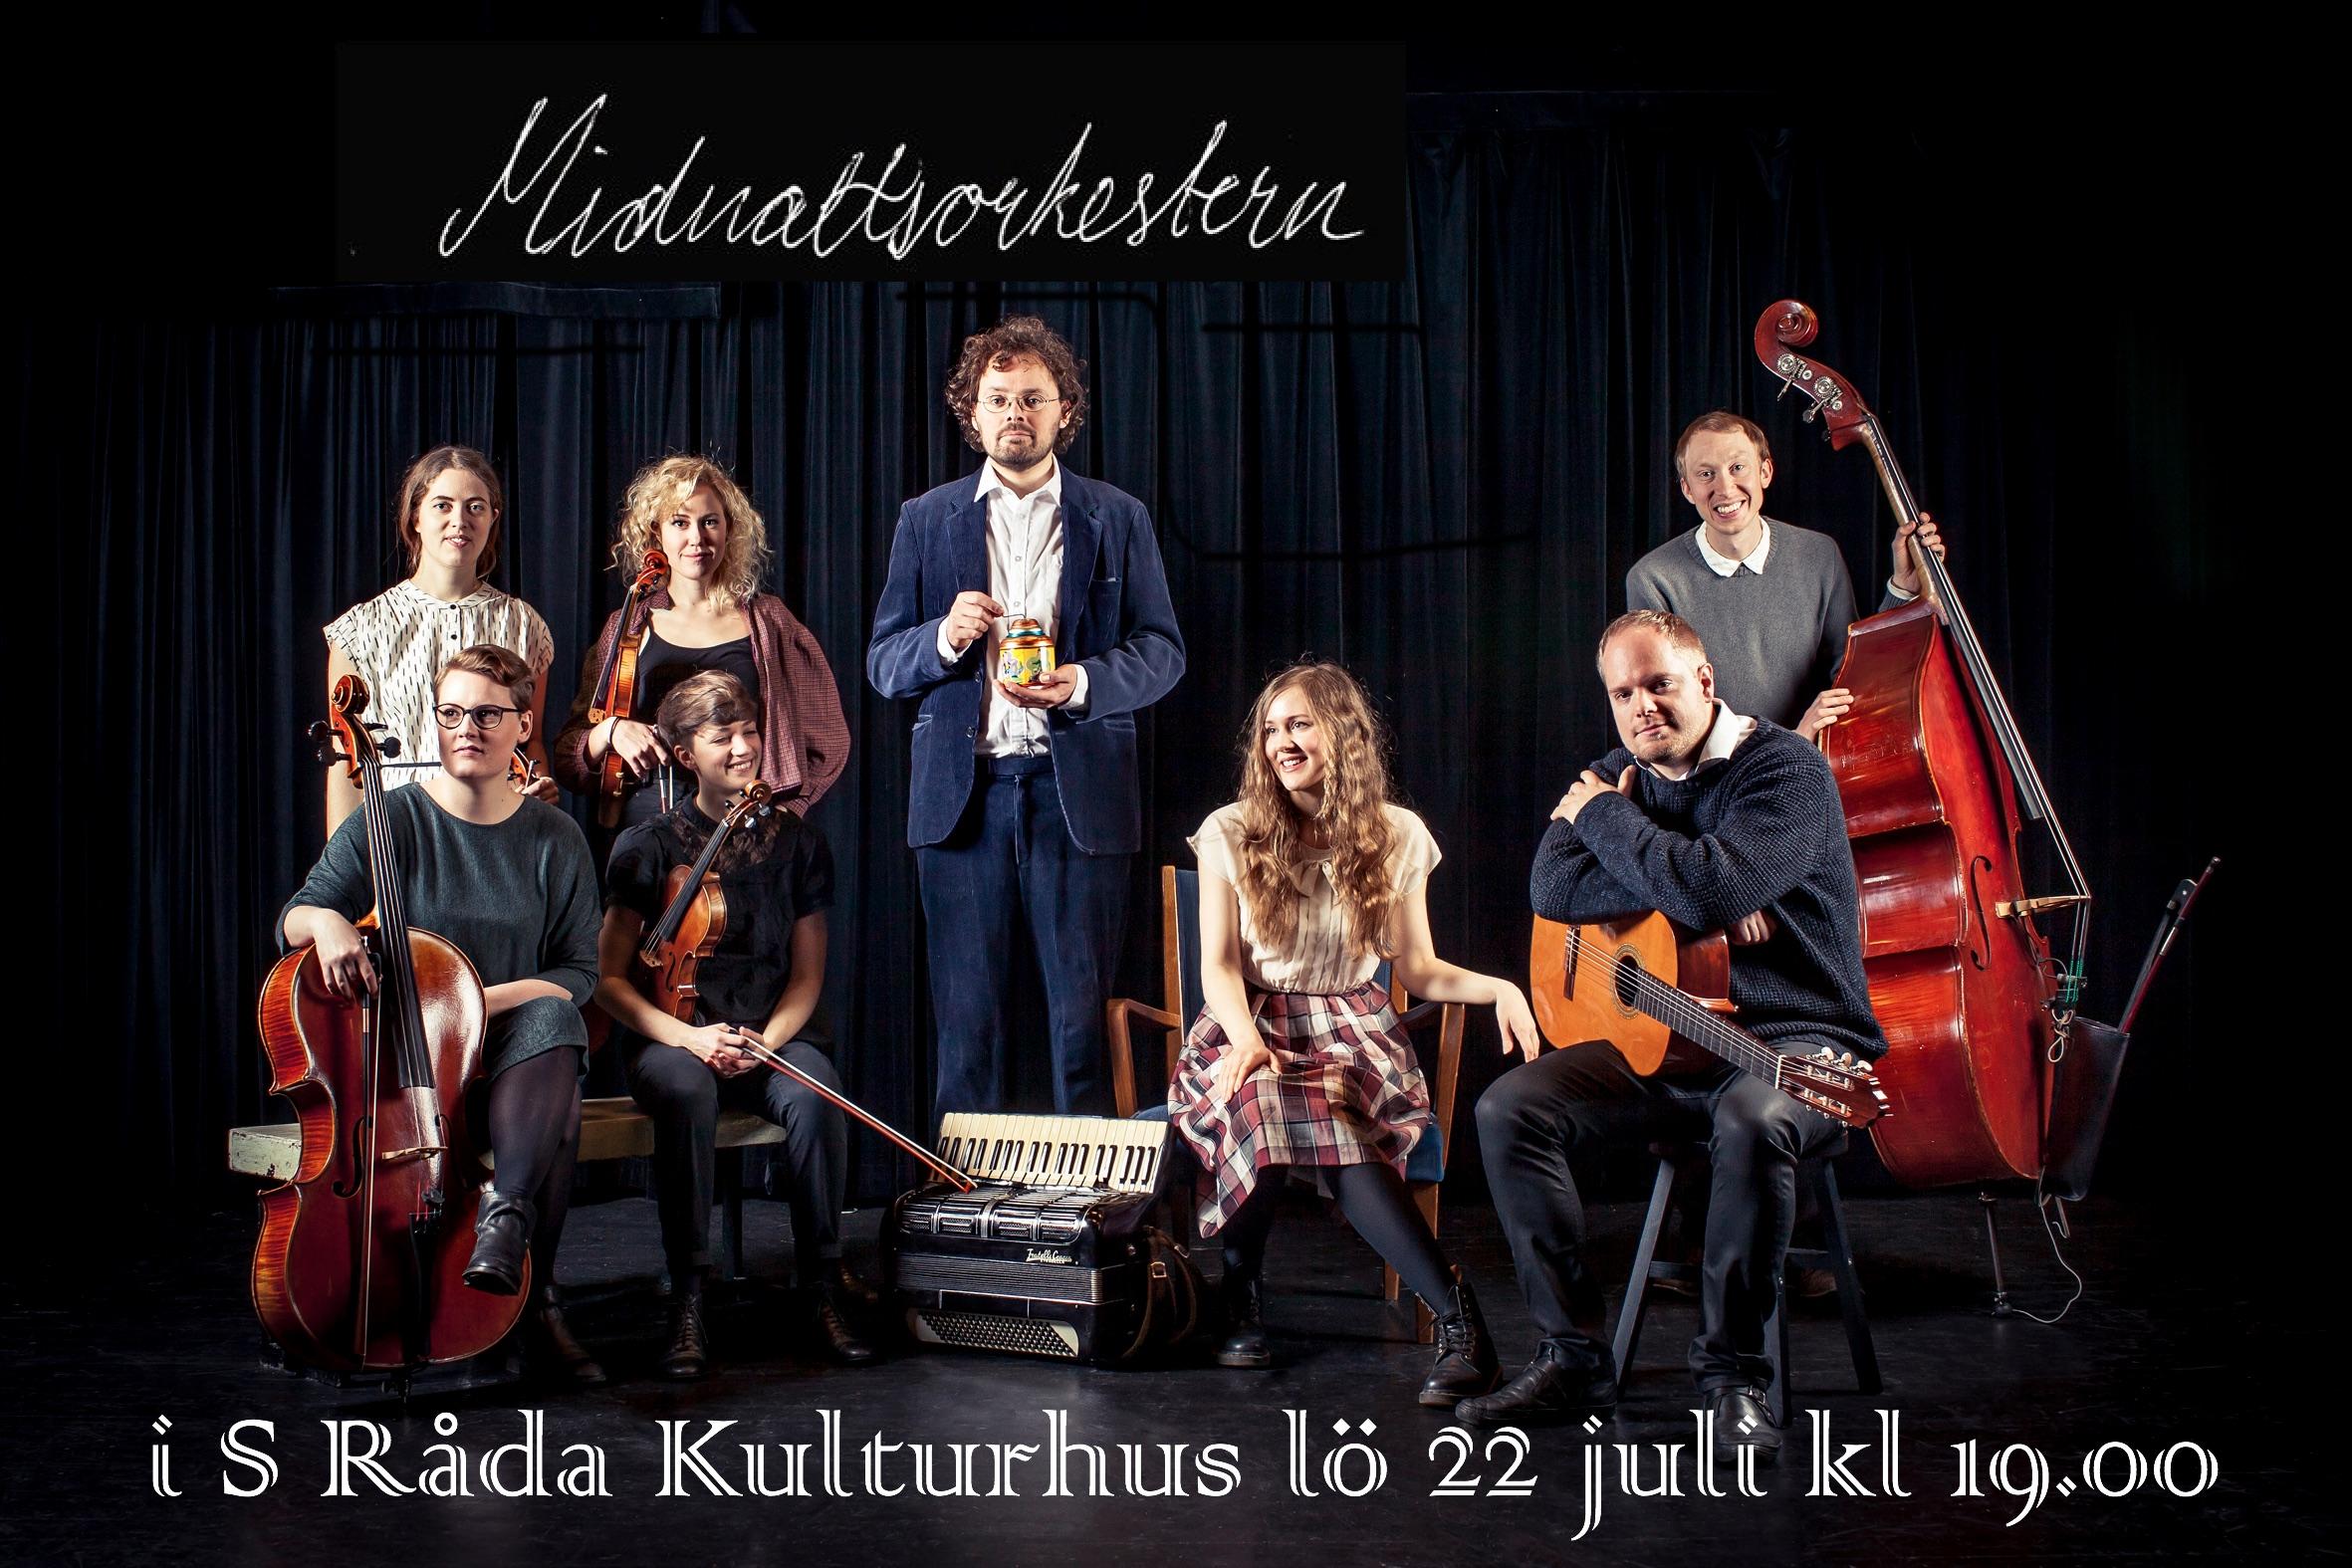 Midnattsorkestern i S Råda Kulturhus 22 juli 2017